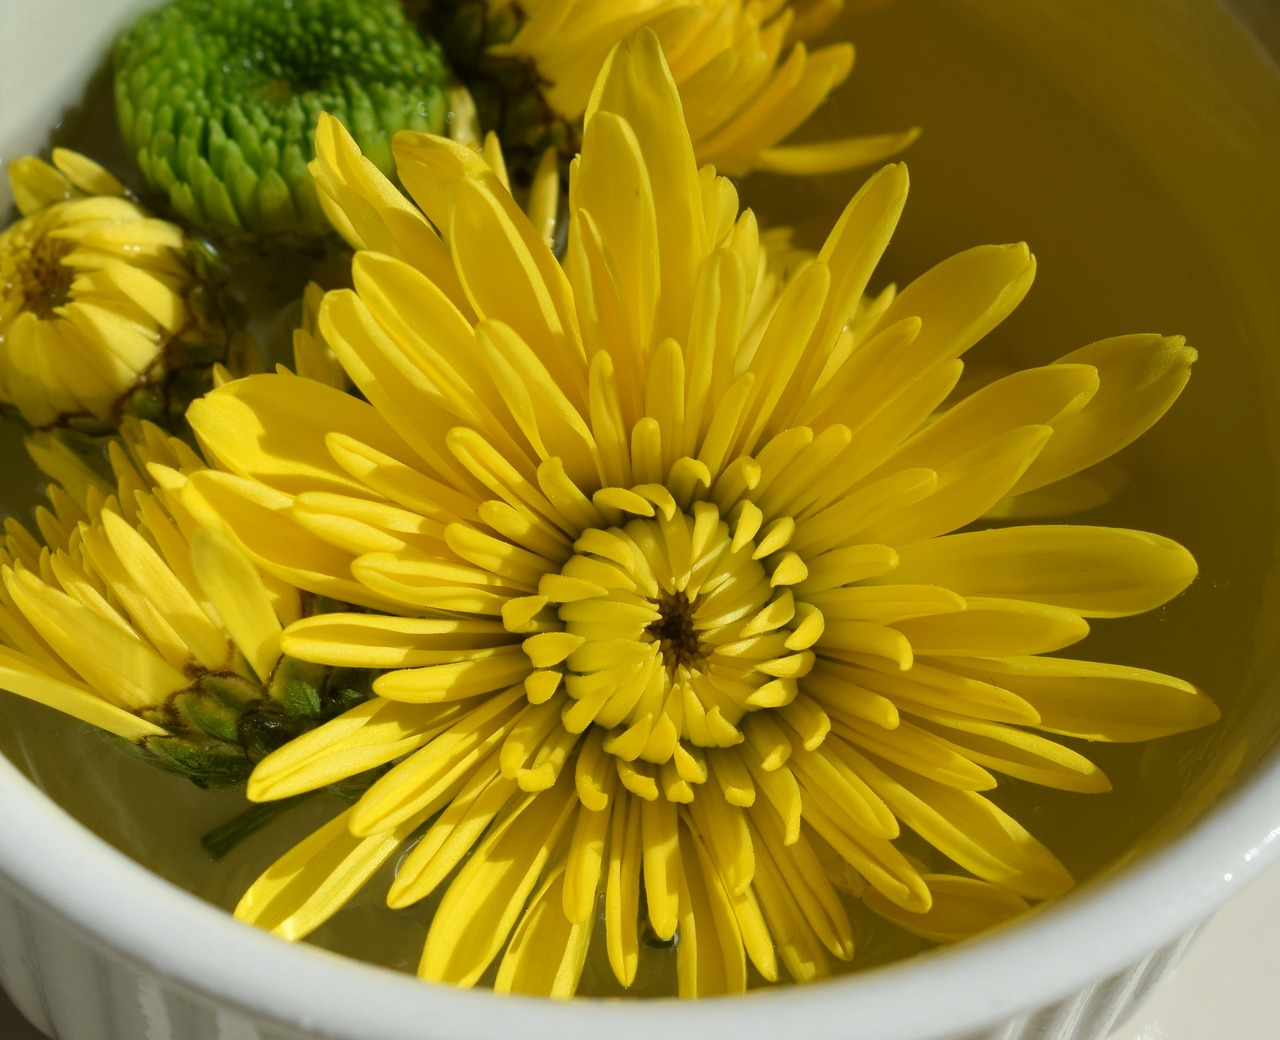 Floating Yellow Chrysanthemumsmumblossombloomflower Free Photo